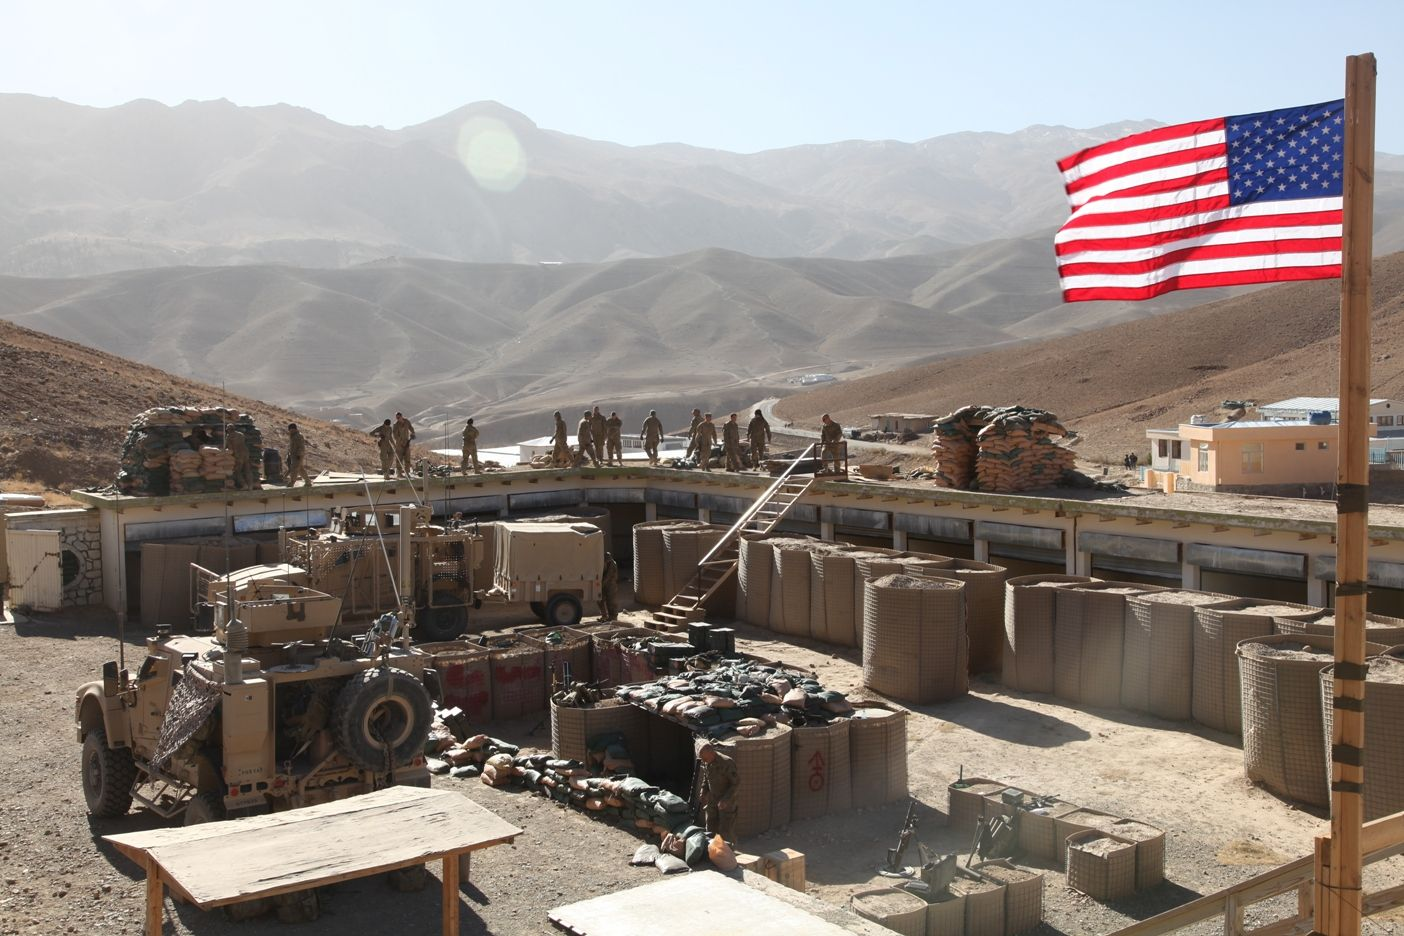 military base Google Search Military base, Military